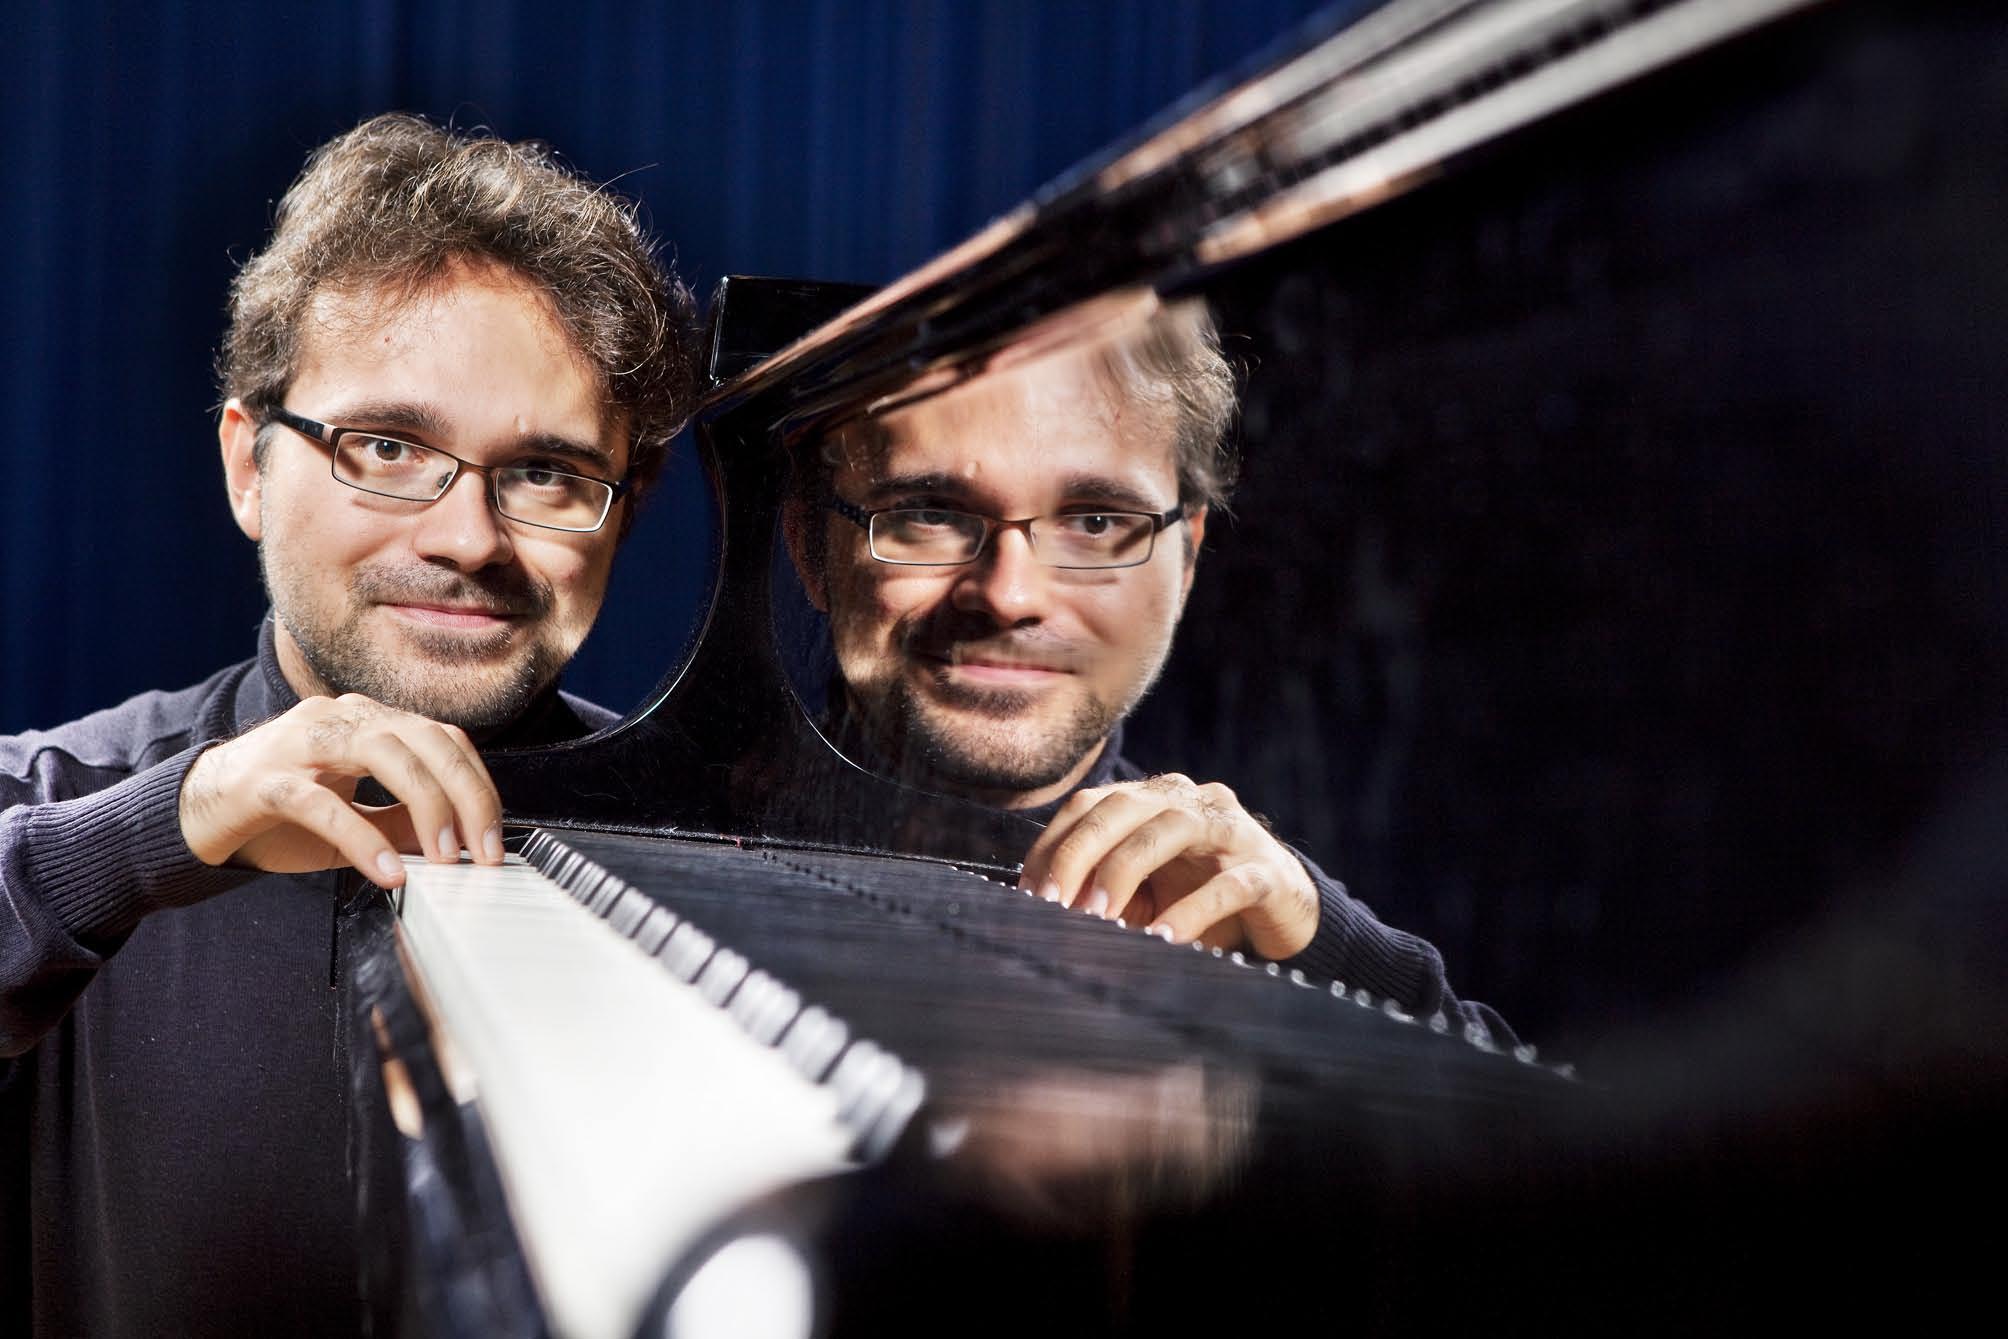 Iberofest: Tuomas Turriago – El Piano Latino – Latinopianomusiikin taikaa